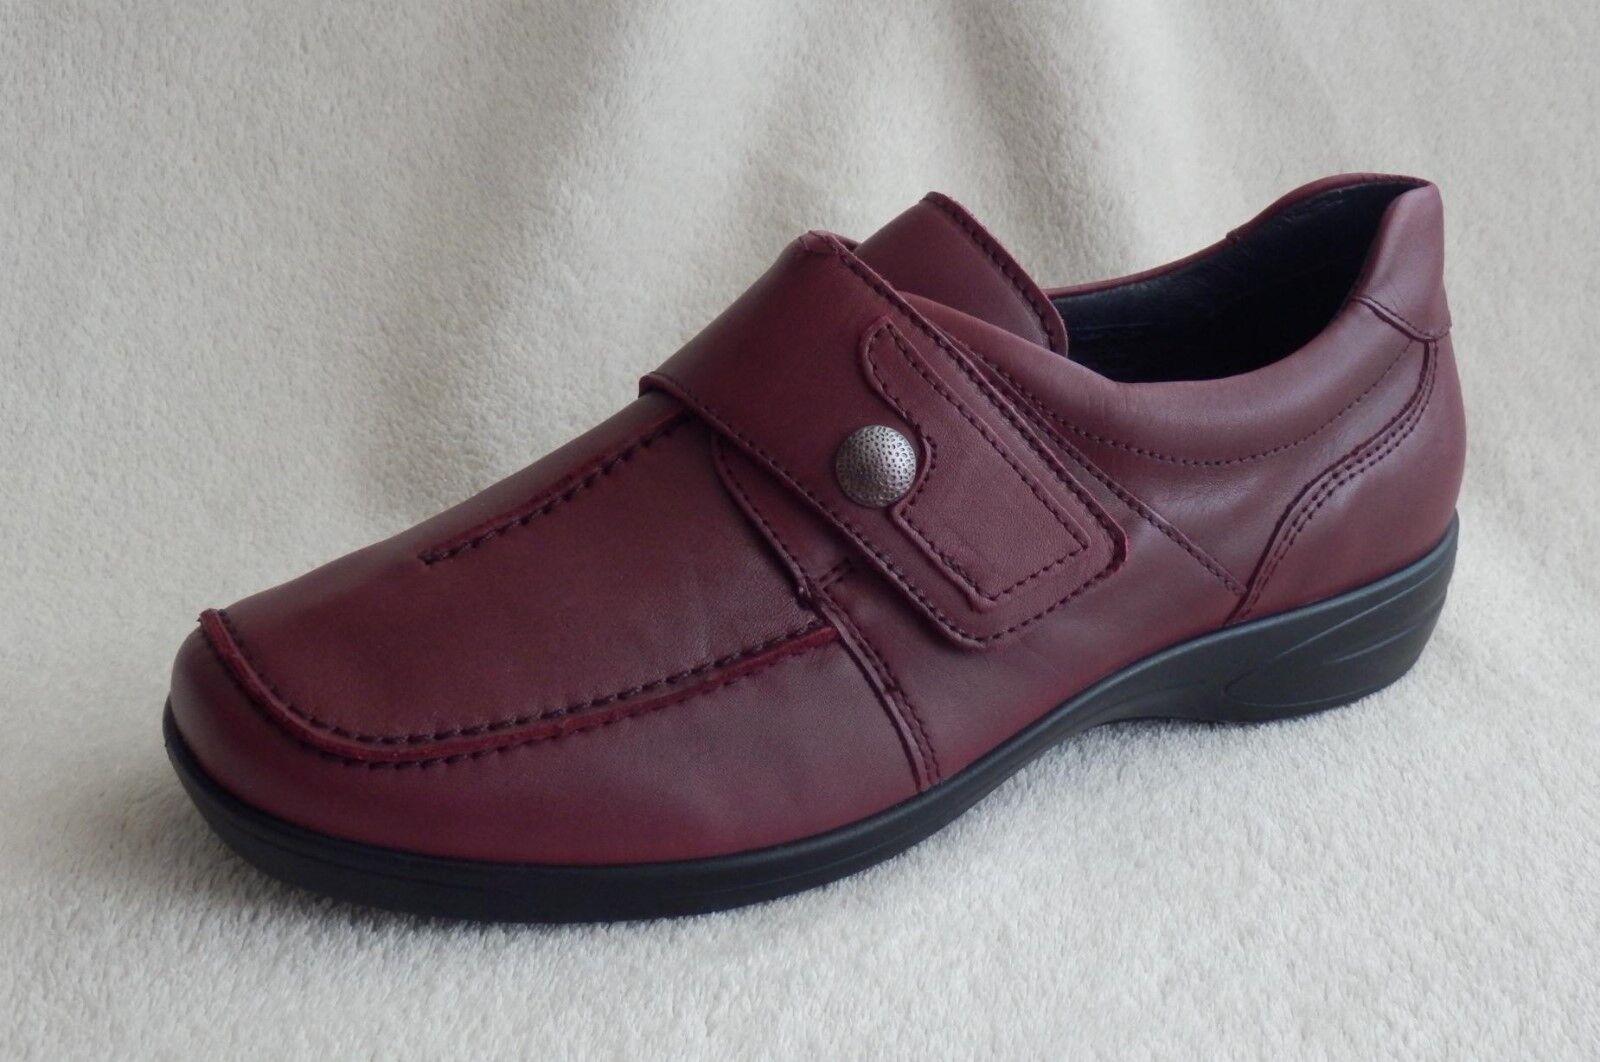 Ara Merano Scarpe Basse Scarpe Velcro Larghezza H 40, borgogna tg. 37,5, 38, 40, H 42 4dc84a